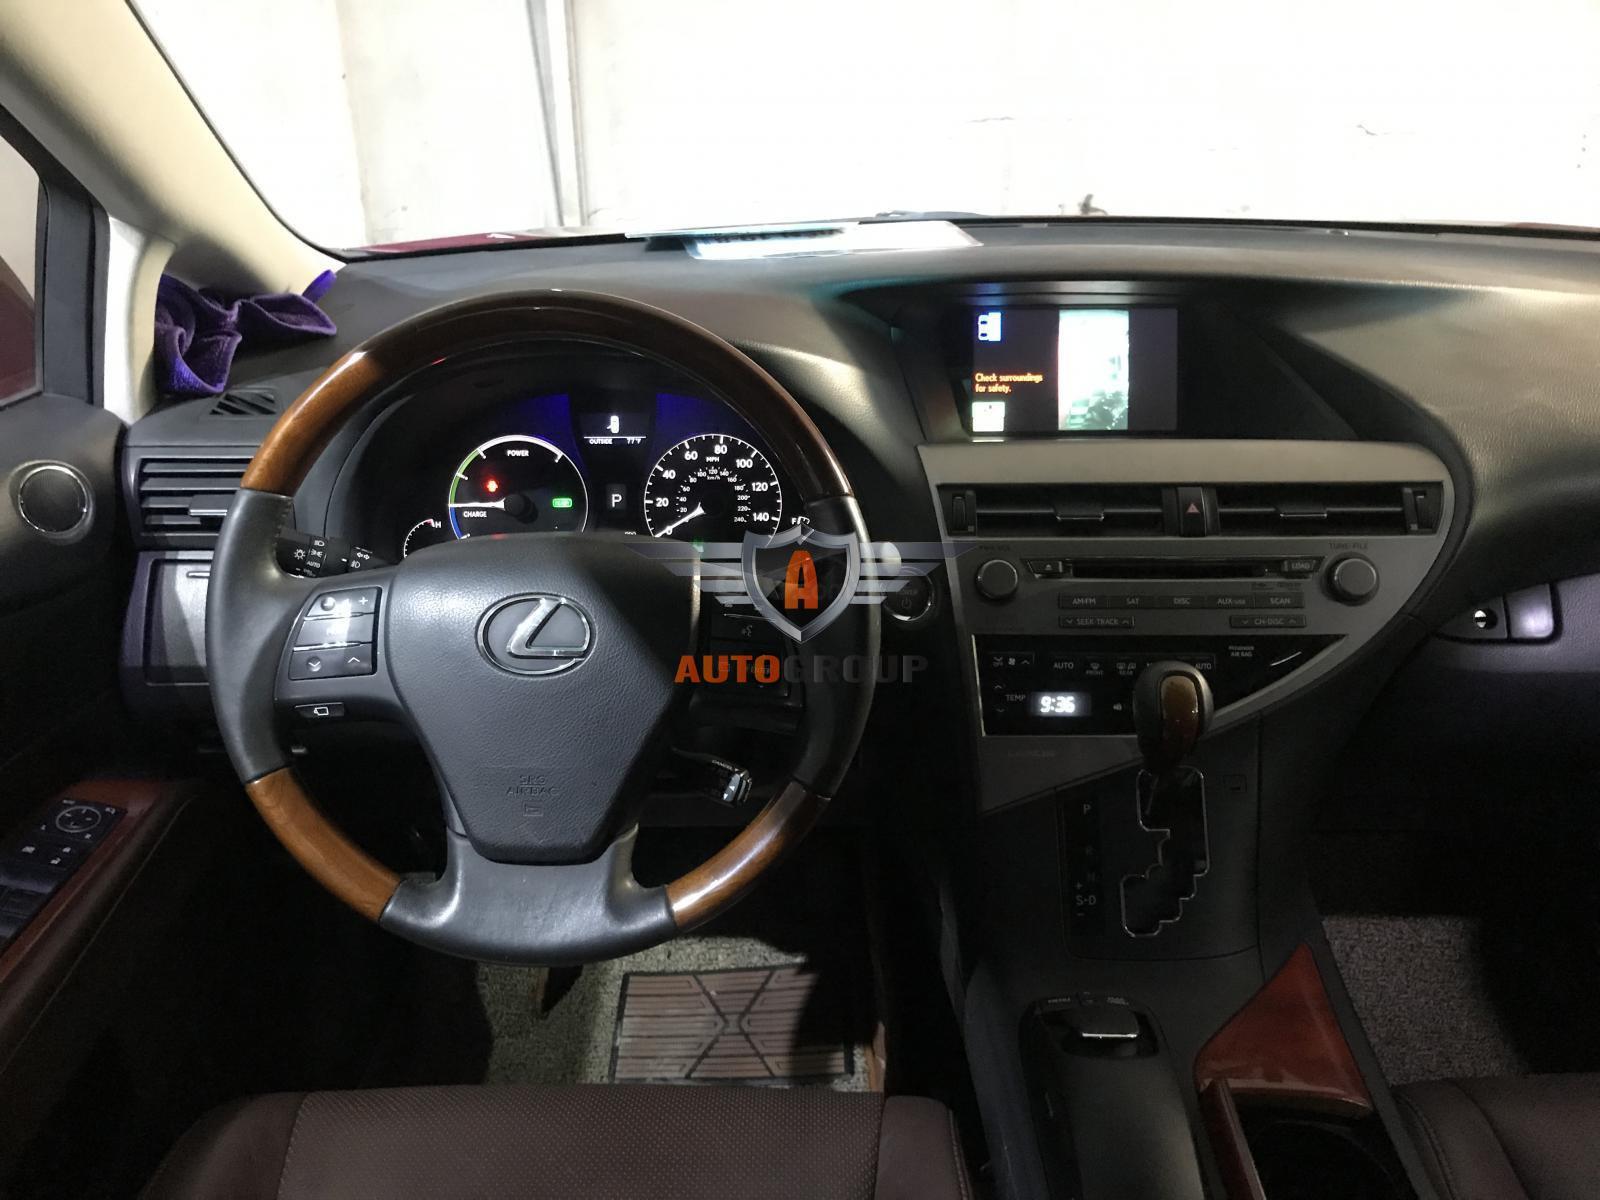 Bán Lexus RX450h model 2009 đỏ đen